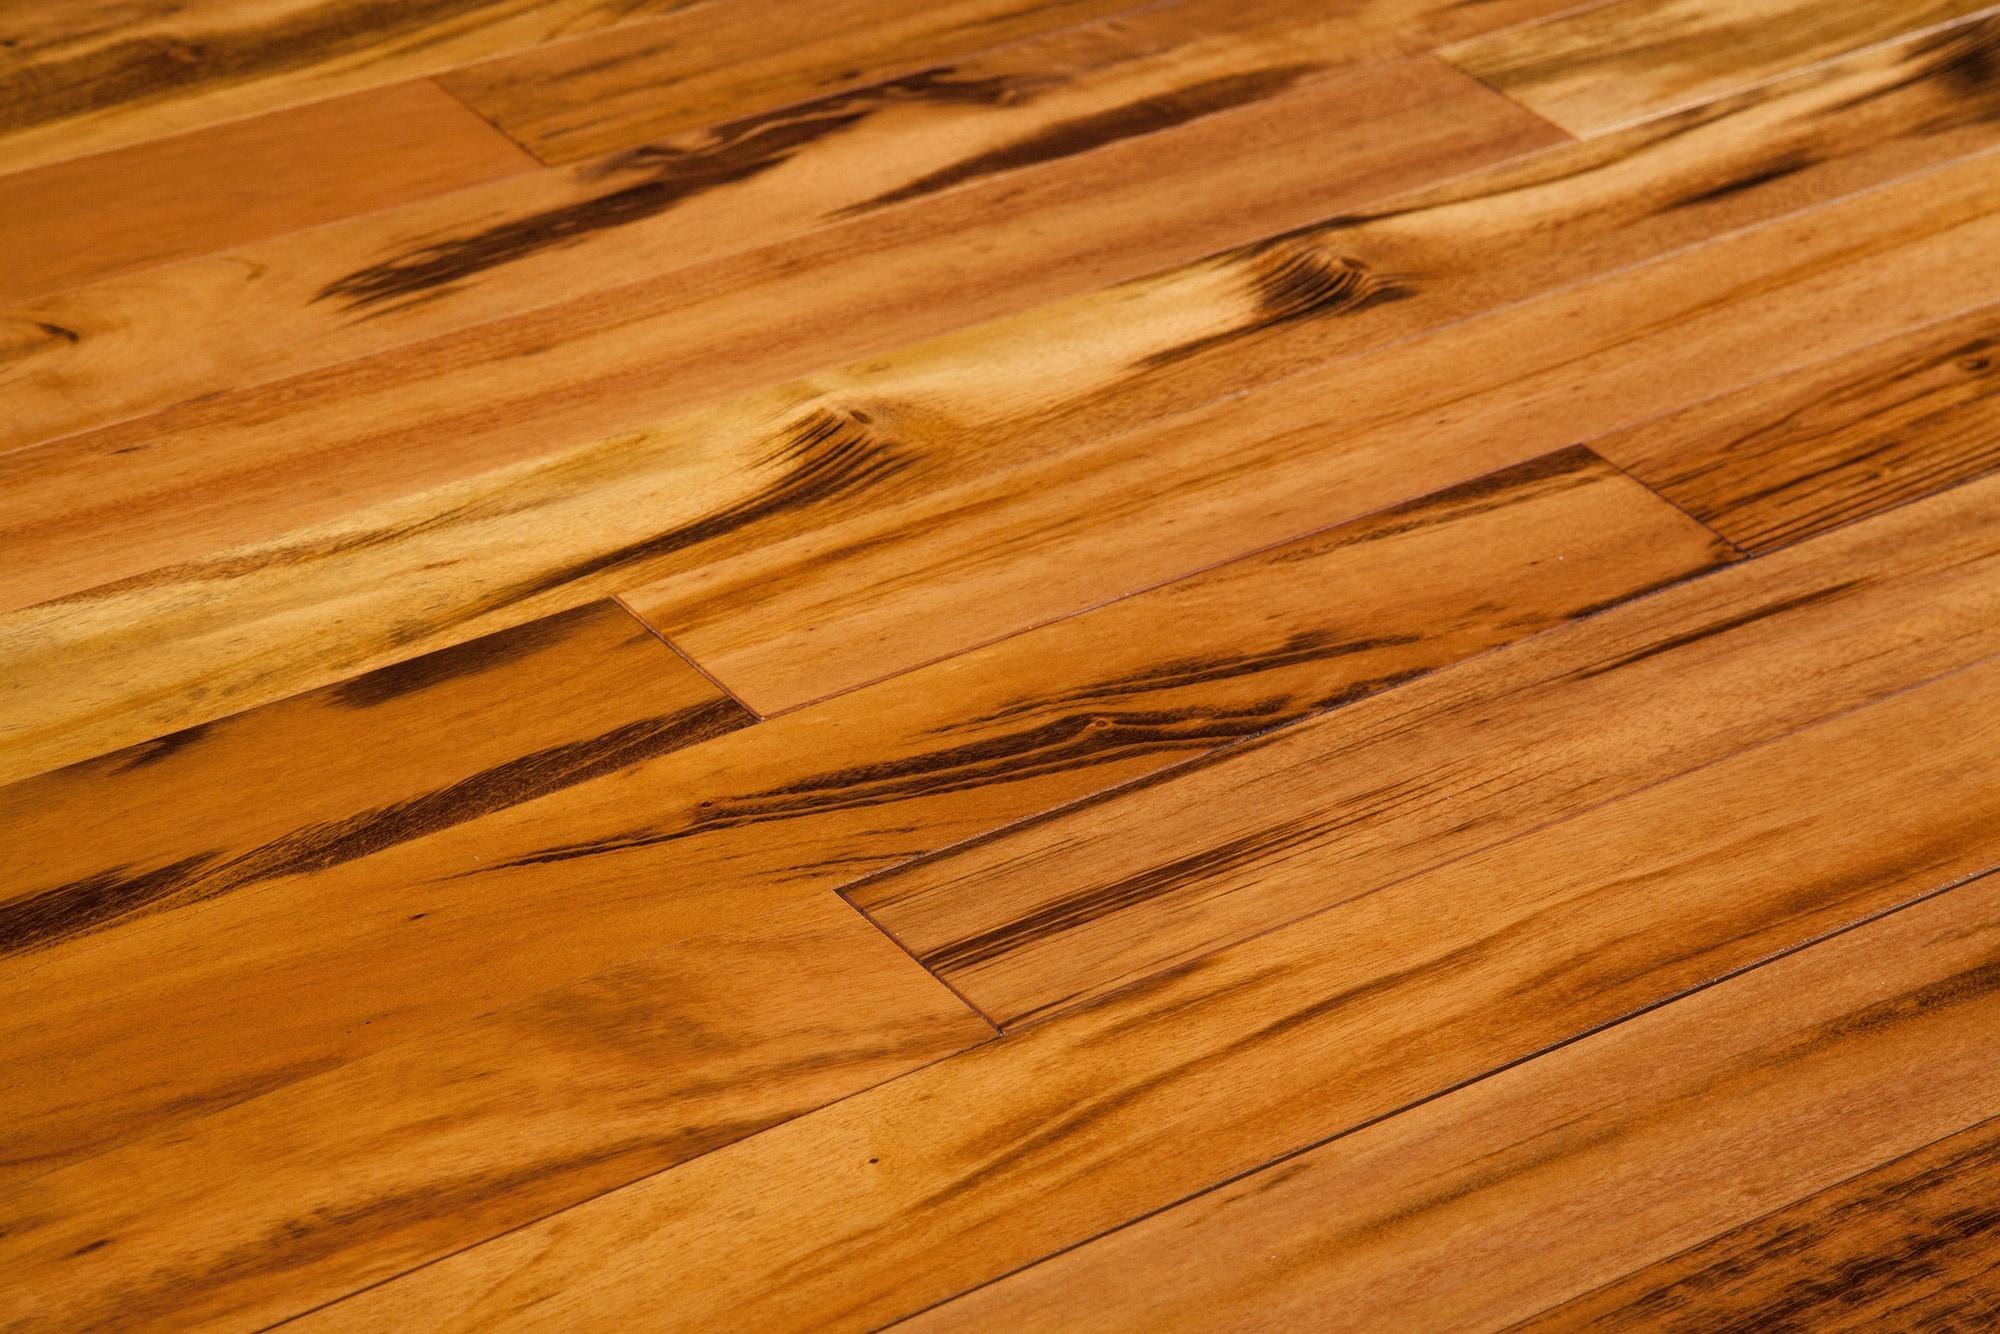 depot white floors wood floor hardwood design wholesale flooring tigerwood chicago tiger home